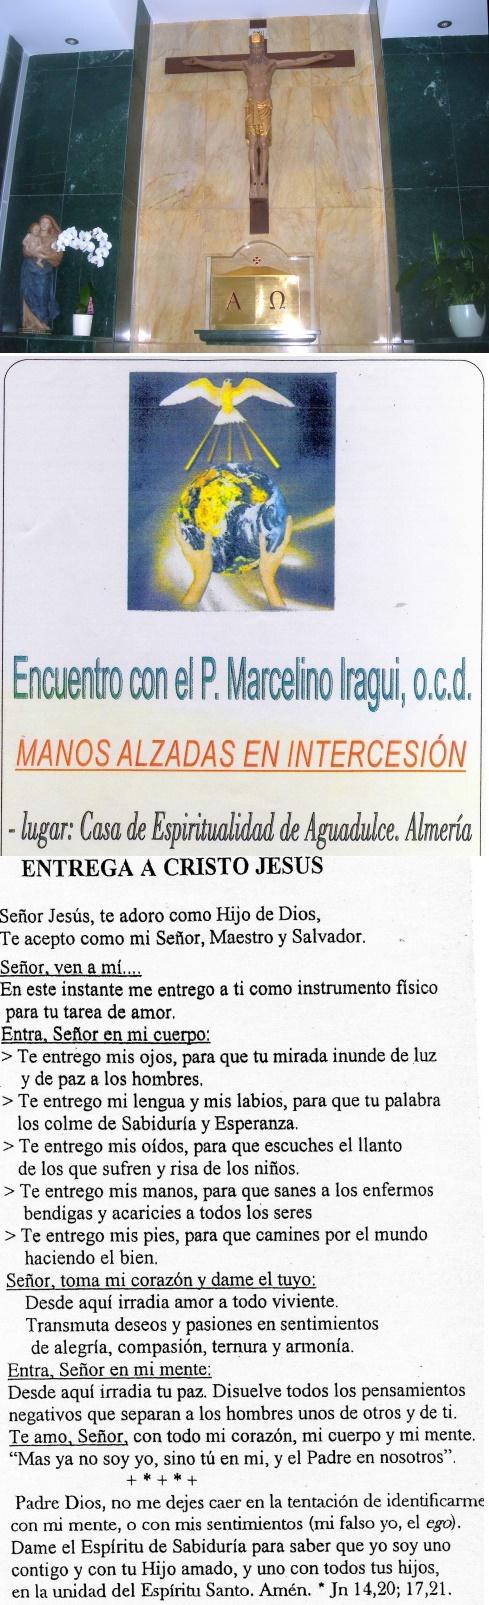 20150404161438-ma-entrega-a-jesus.jpg